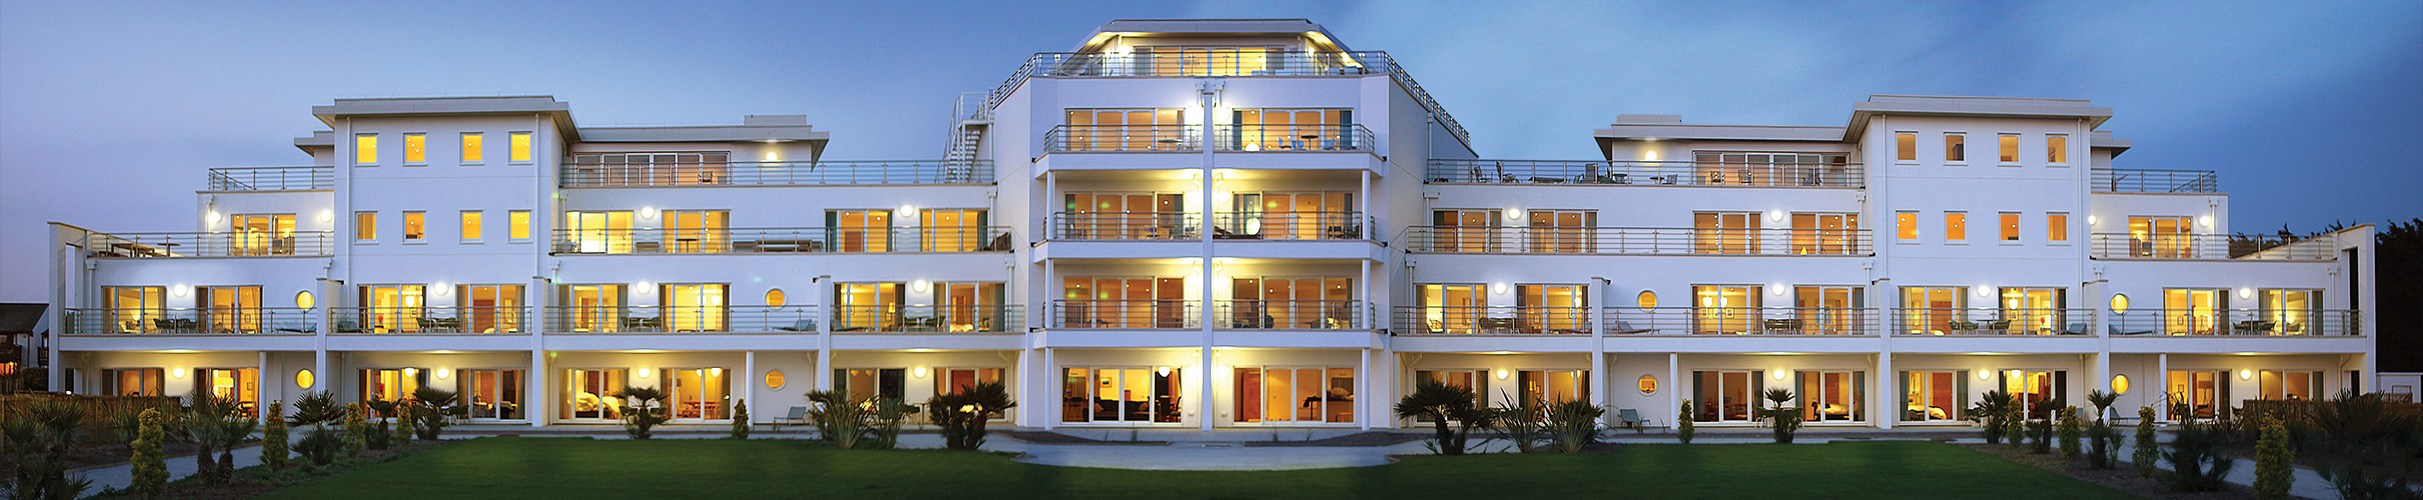 genius-home-slide-hotel